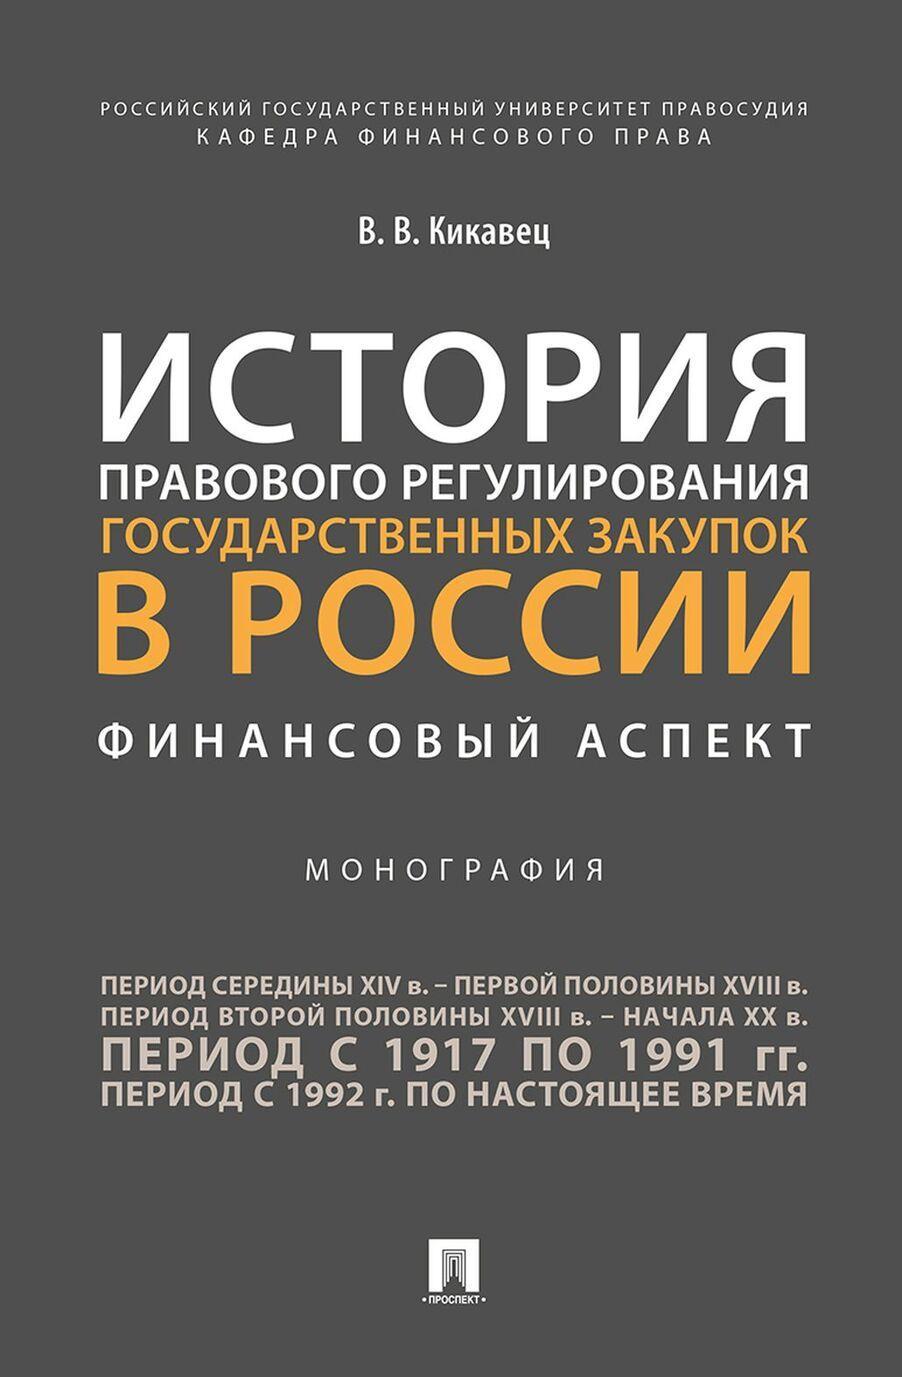 Istorija pravovogo regulirovanija gosudarstvennykh zakupok v Rossii: finansovyj aspekt.Monografija.-M.:Prospekt,2020.